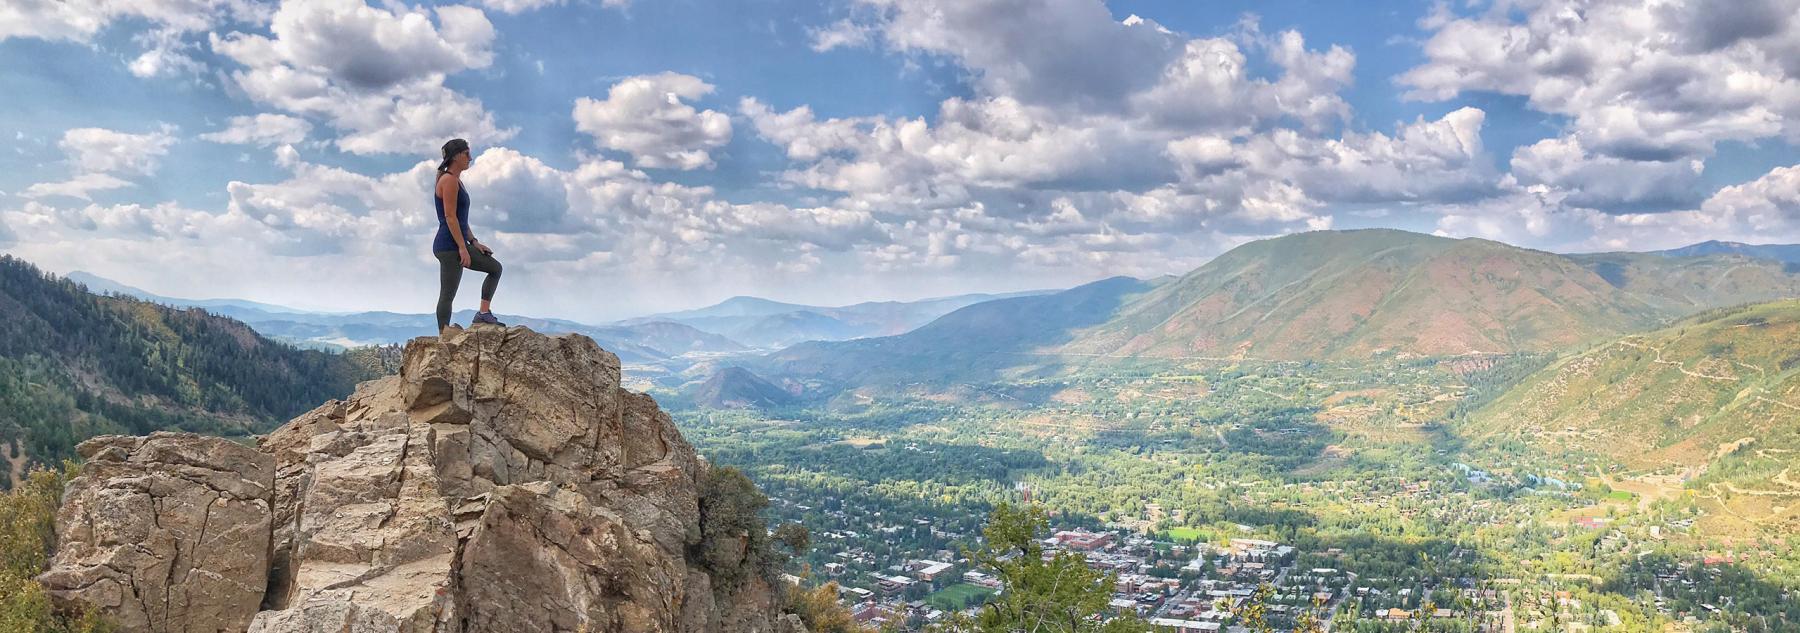 Ute Trail on Aspen Mountain